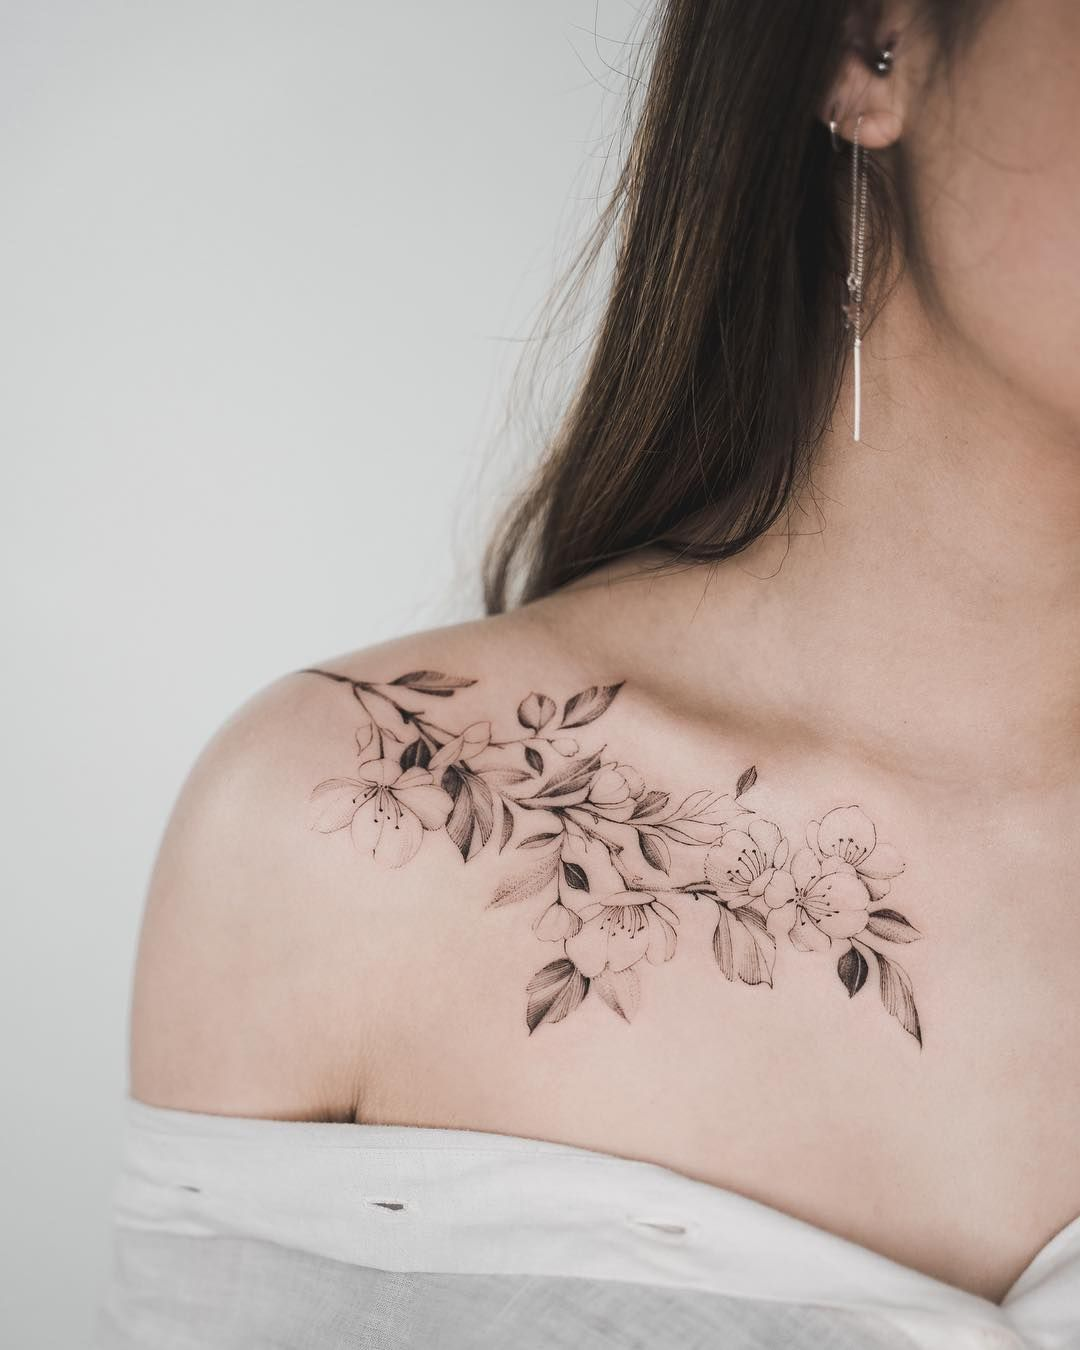 Tatuagem Feminina Delicada No Ombro At Tritoanseventhday